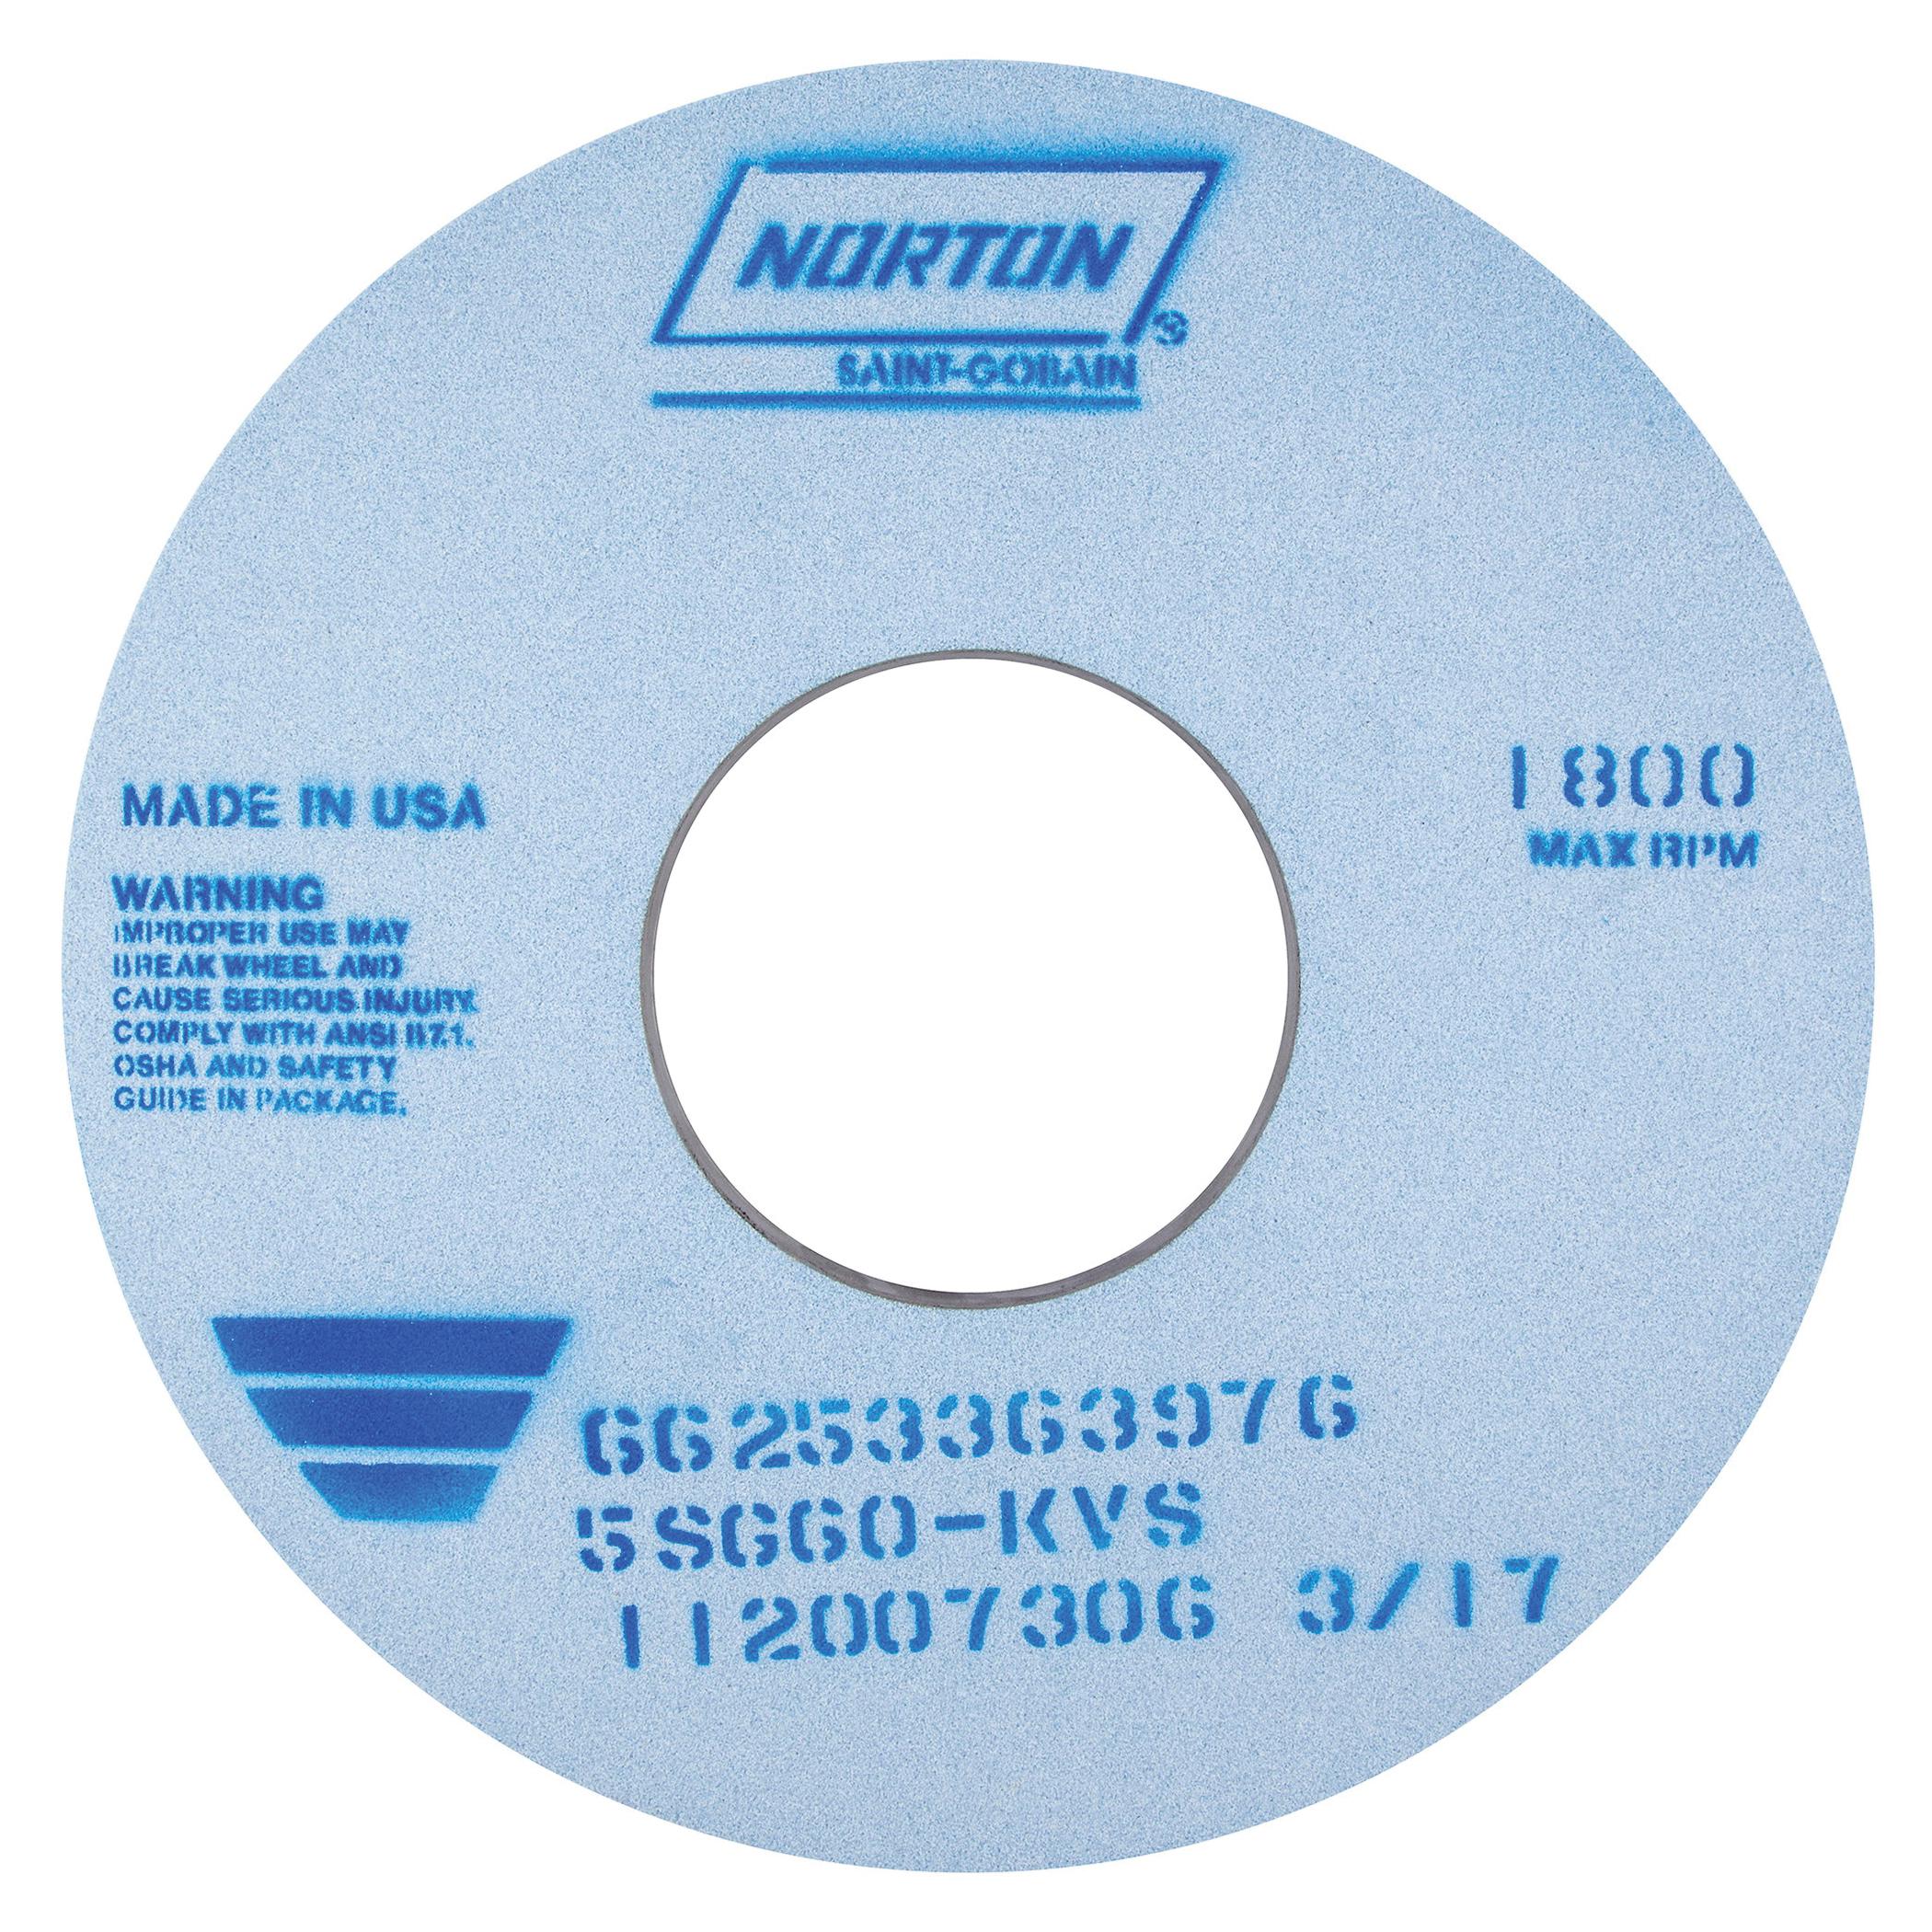 Norton® 66253364003 5SG Straight Toolroom Wheel, 14 in Dia x 1 in THK, 5 in Center Hole, 80 Grit, Ceramic Alumina/Friable Aluminum Oxide Abrasive